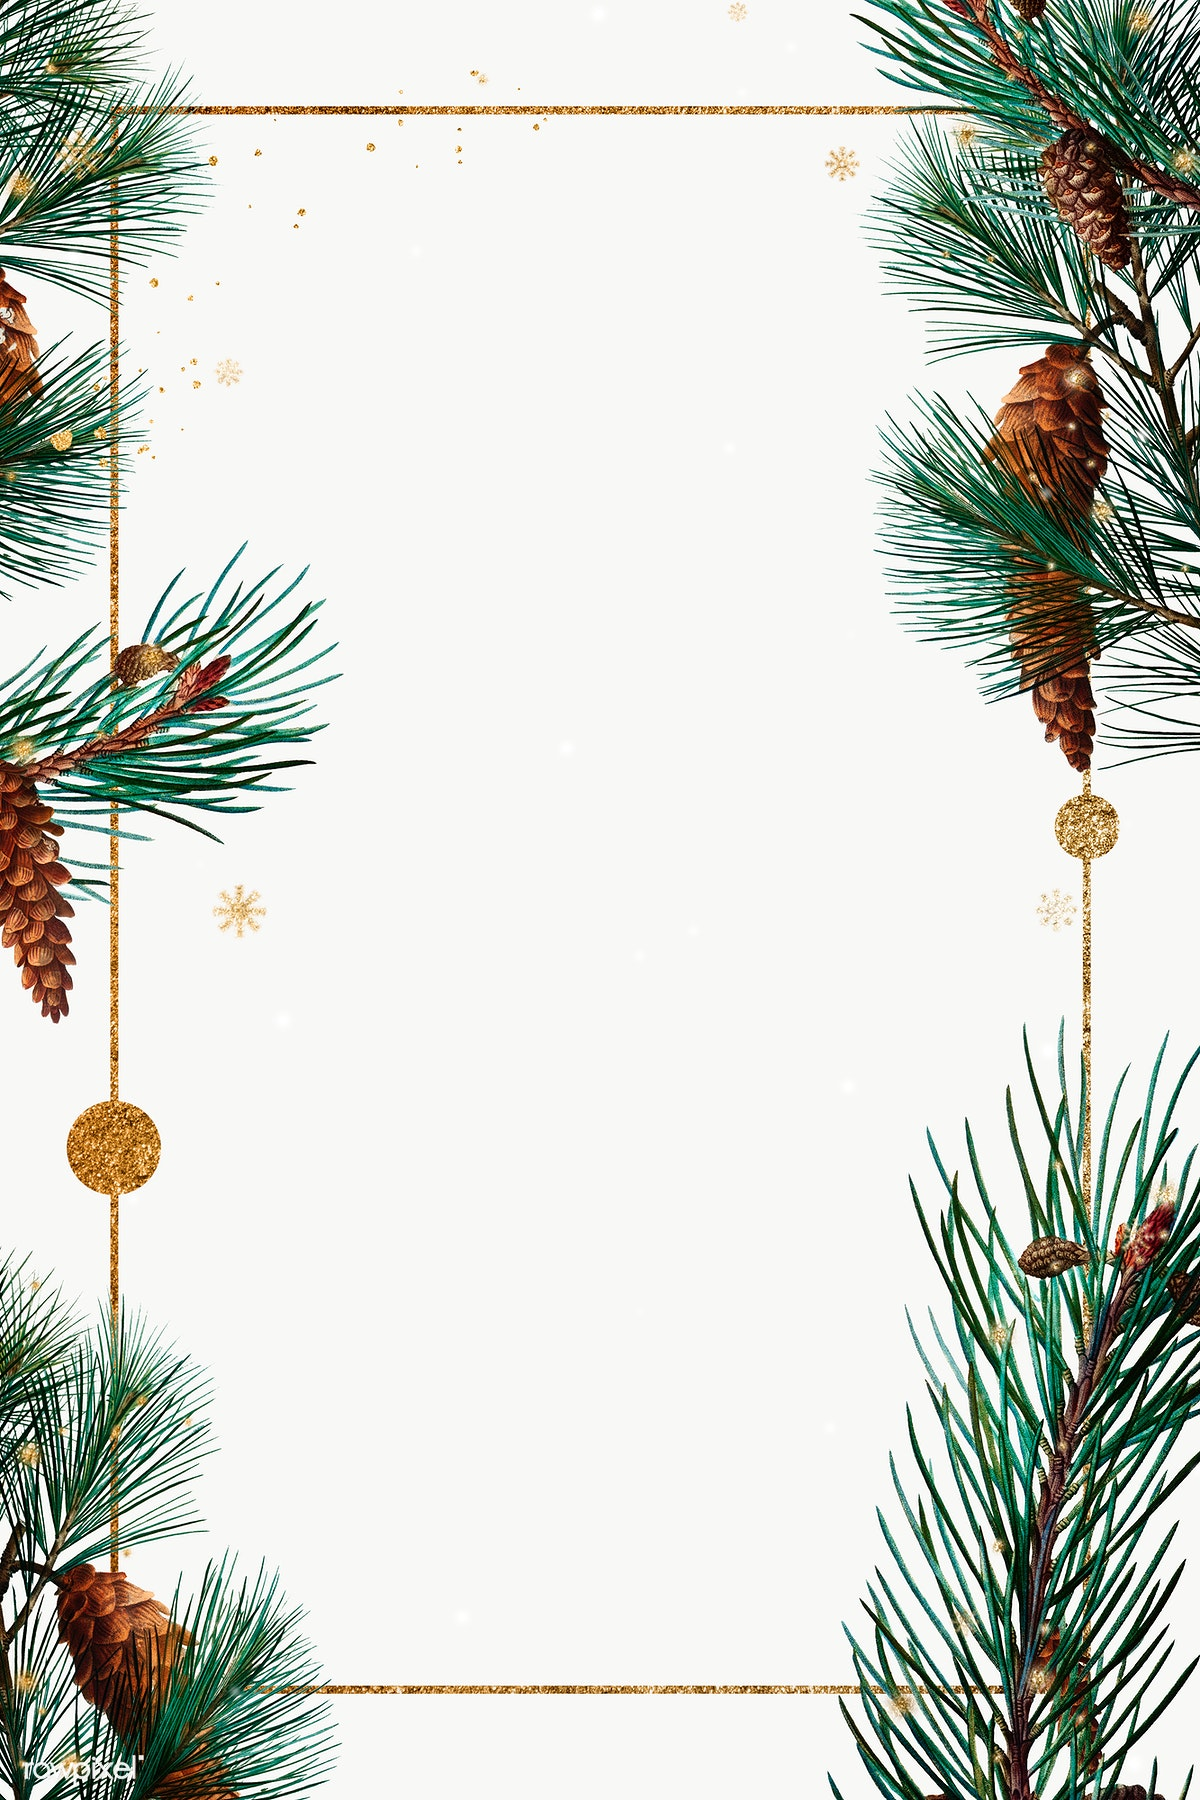 Christmas Frame.Download Premium Image Of Golden Rectangle Christmas Frame Design 1228811